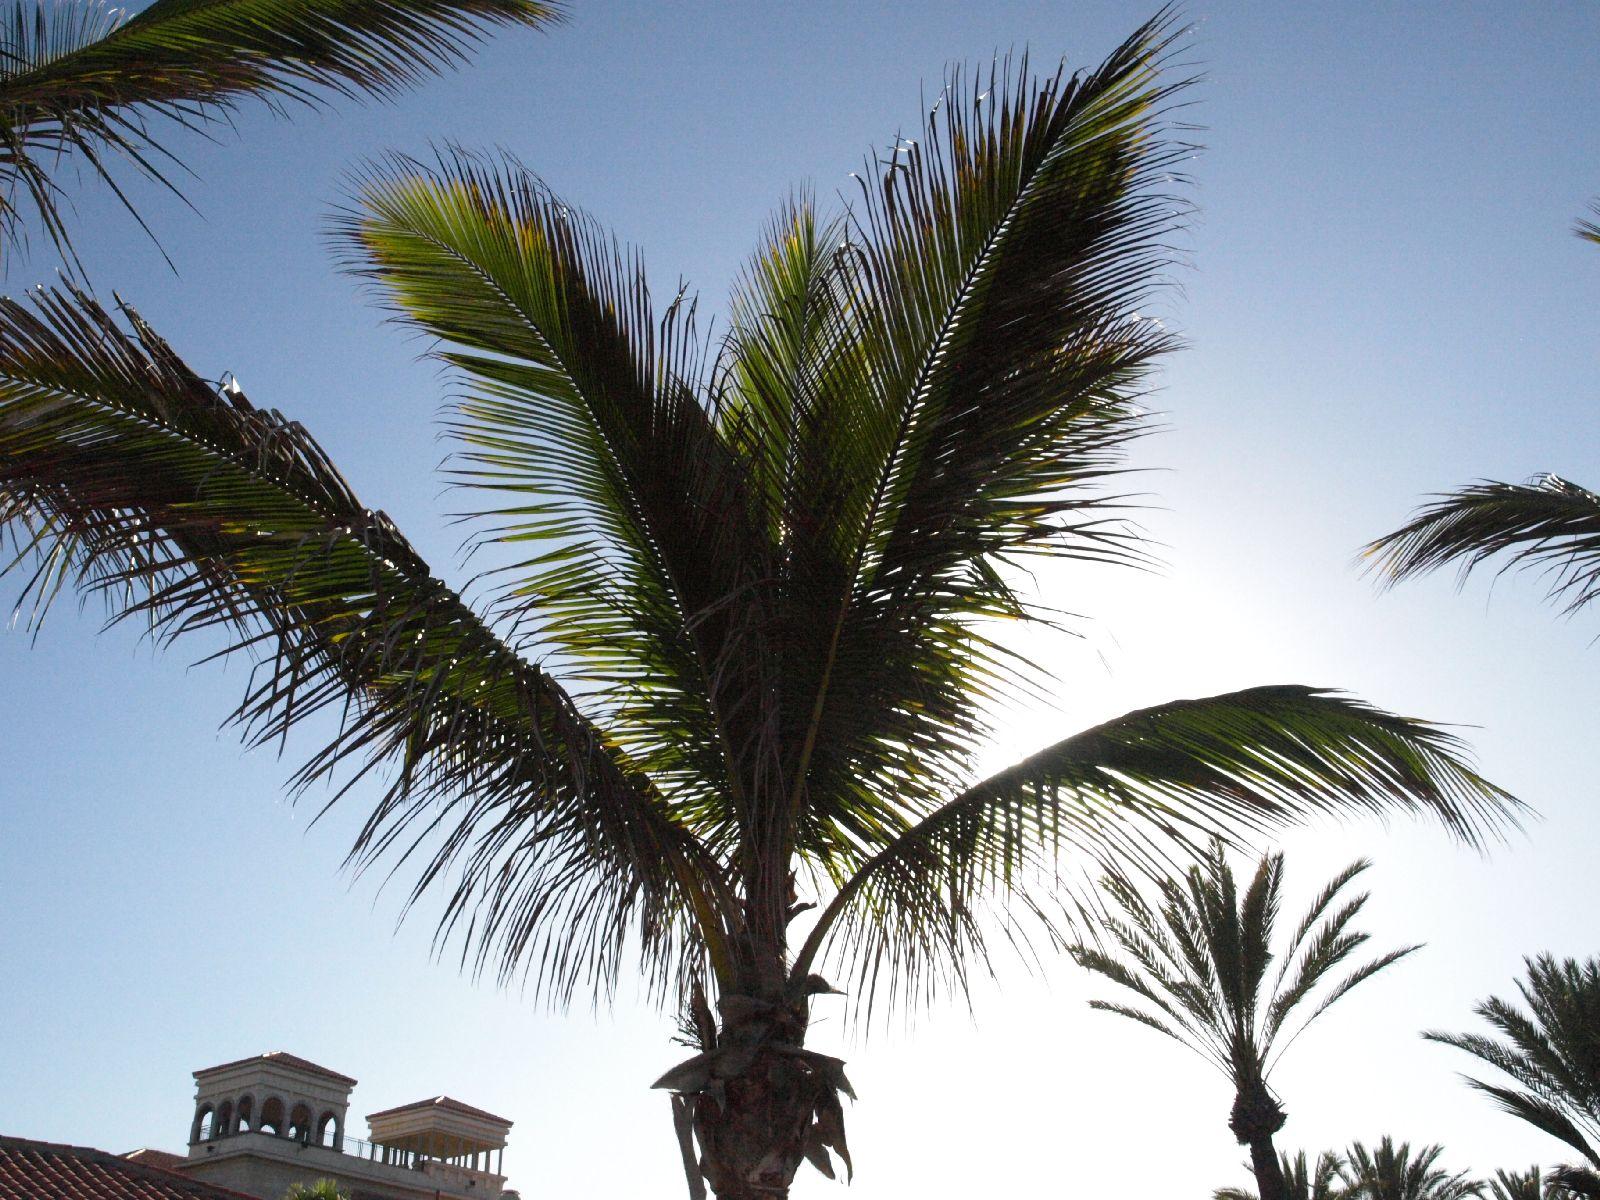 Plants-Trees_Photo_Texture_B_P5224076